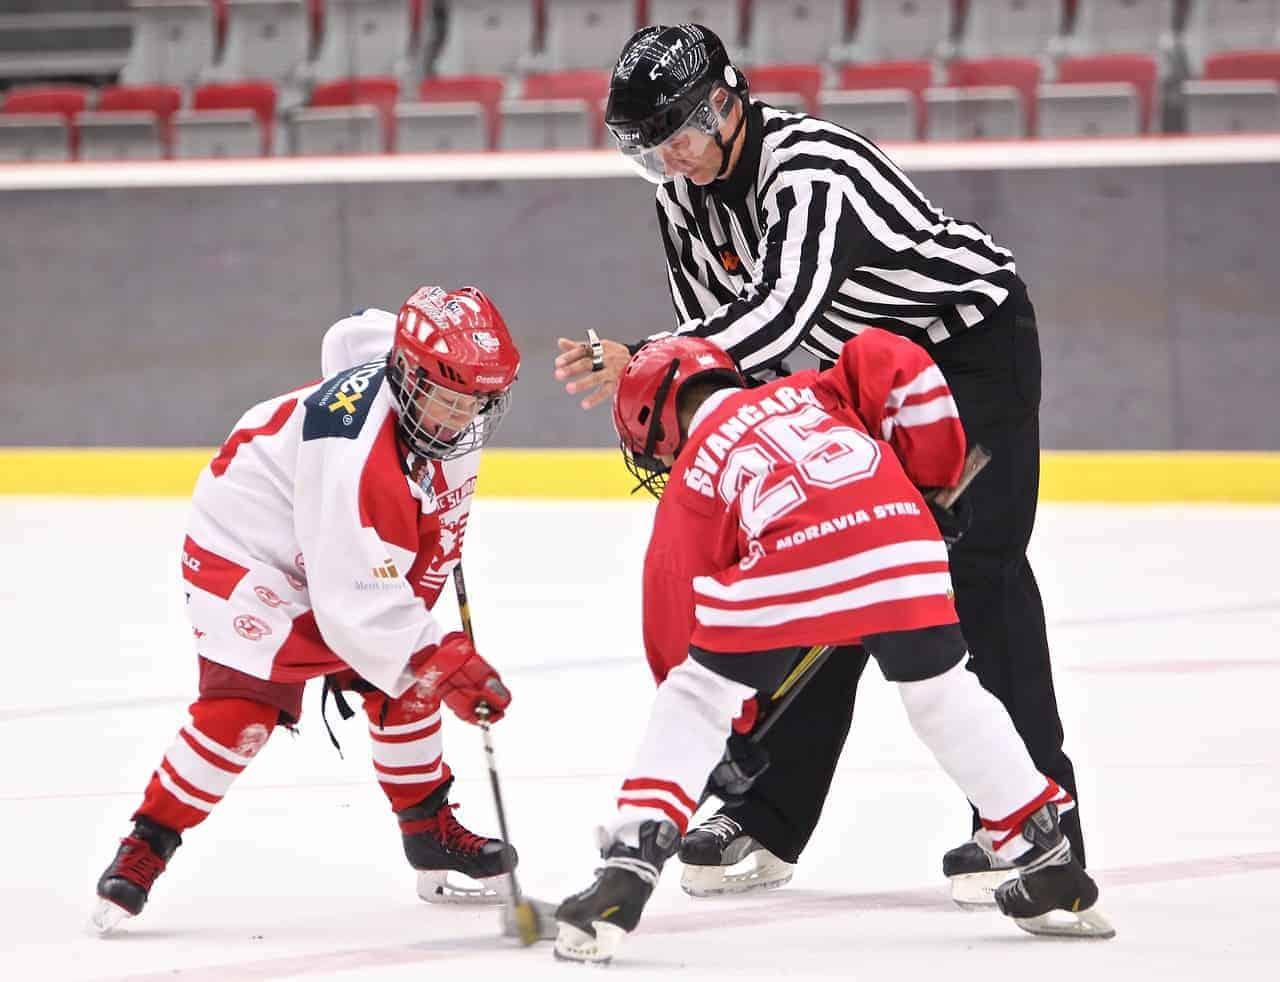 Hockey-referee.jpg